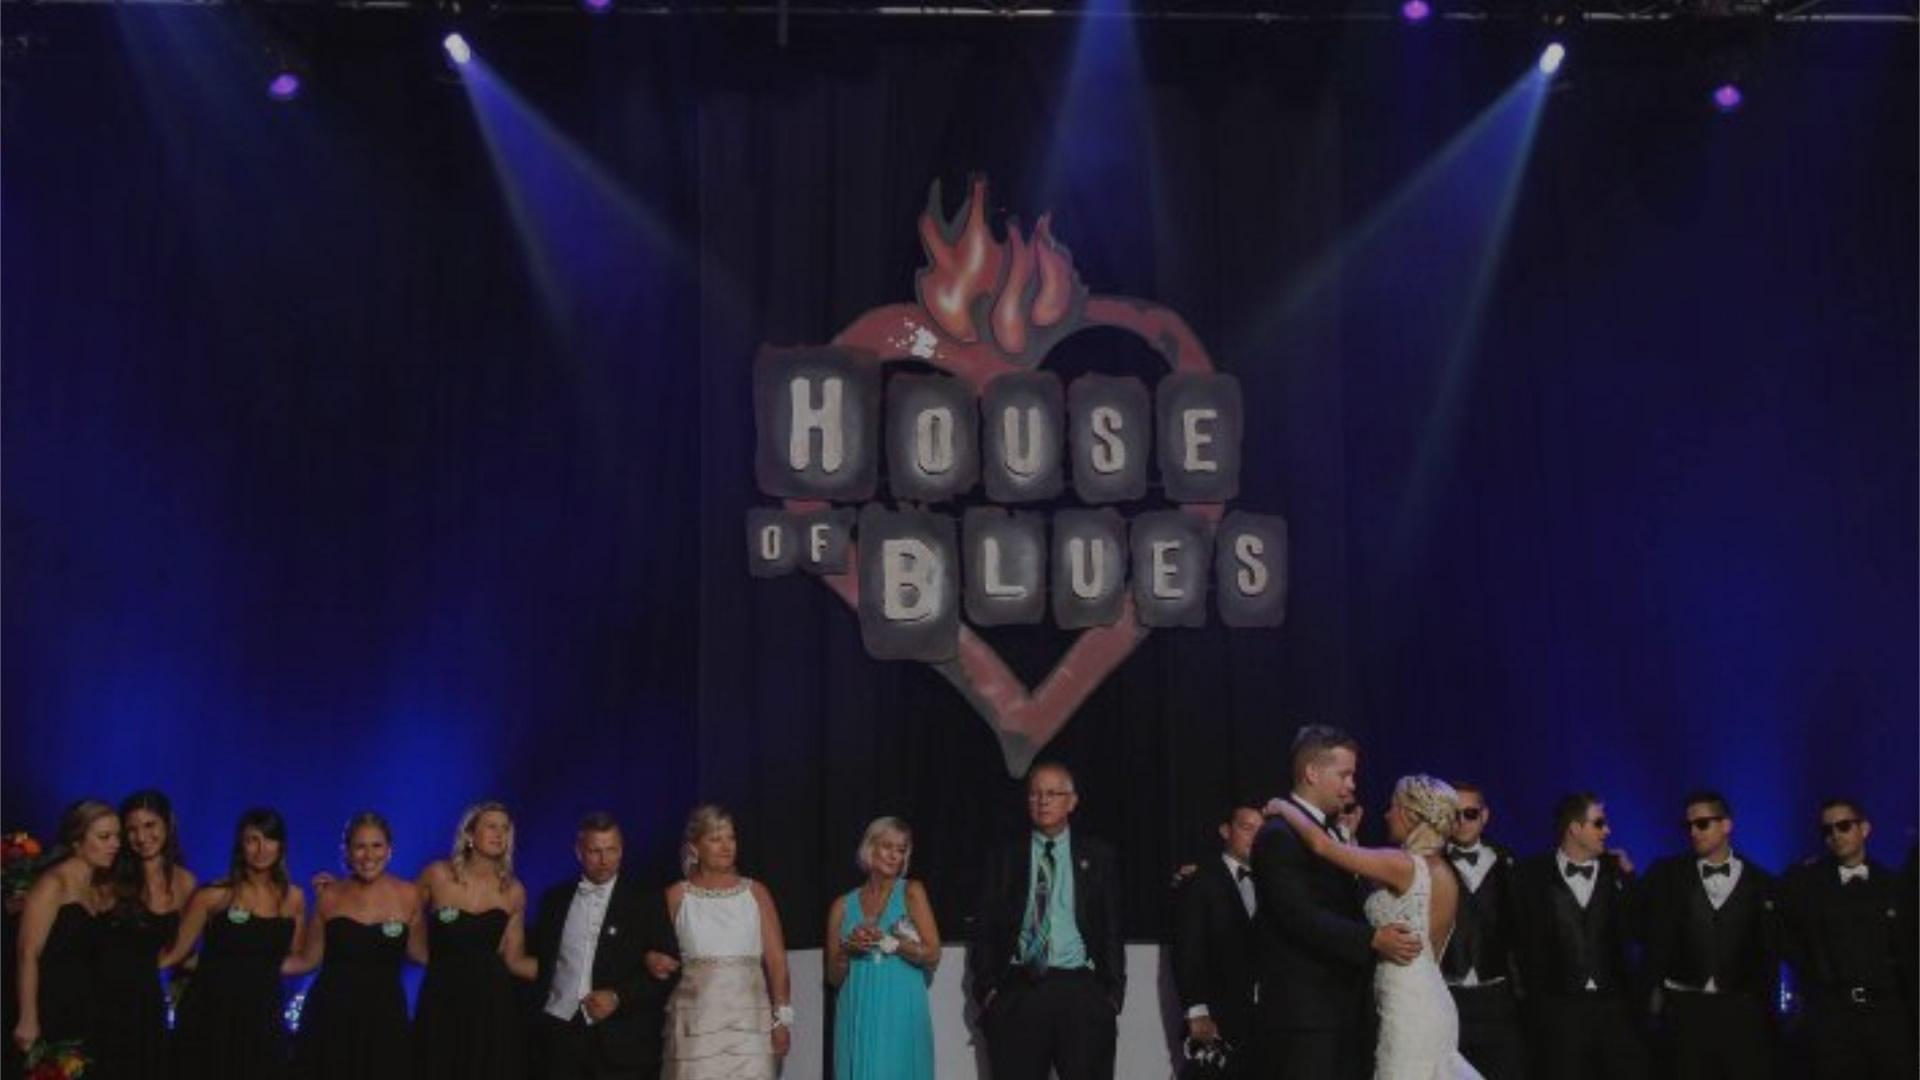 House of Blues - Sensational Ceremonies